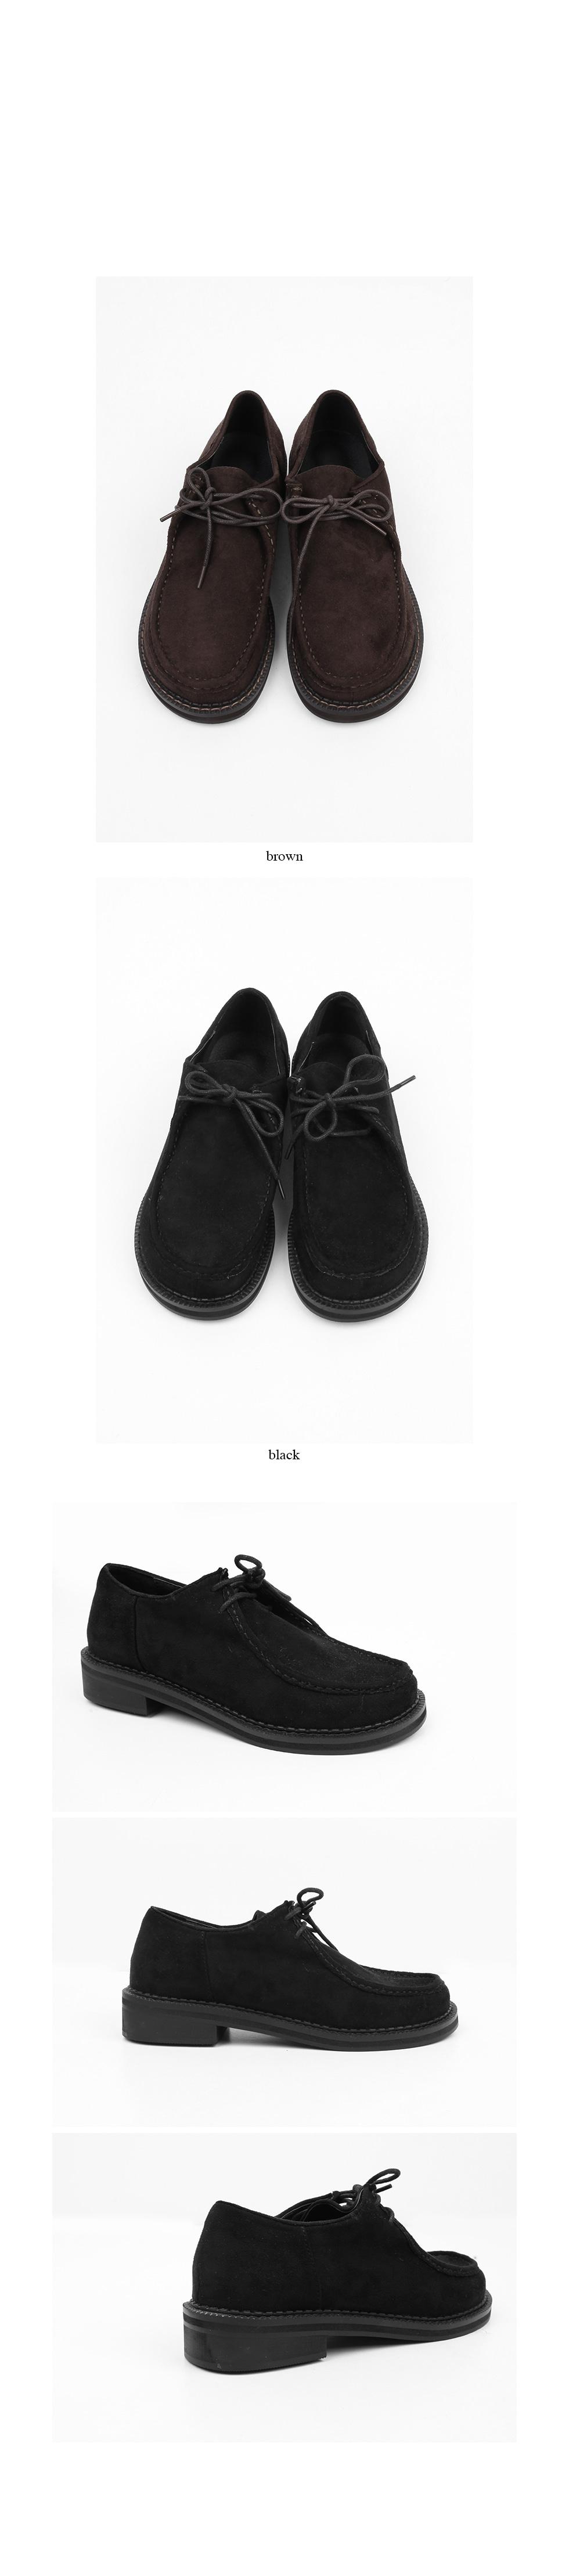 suede platform cool shoes